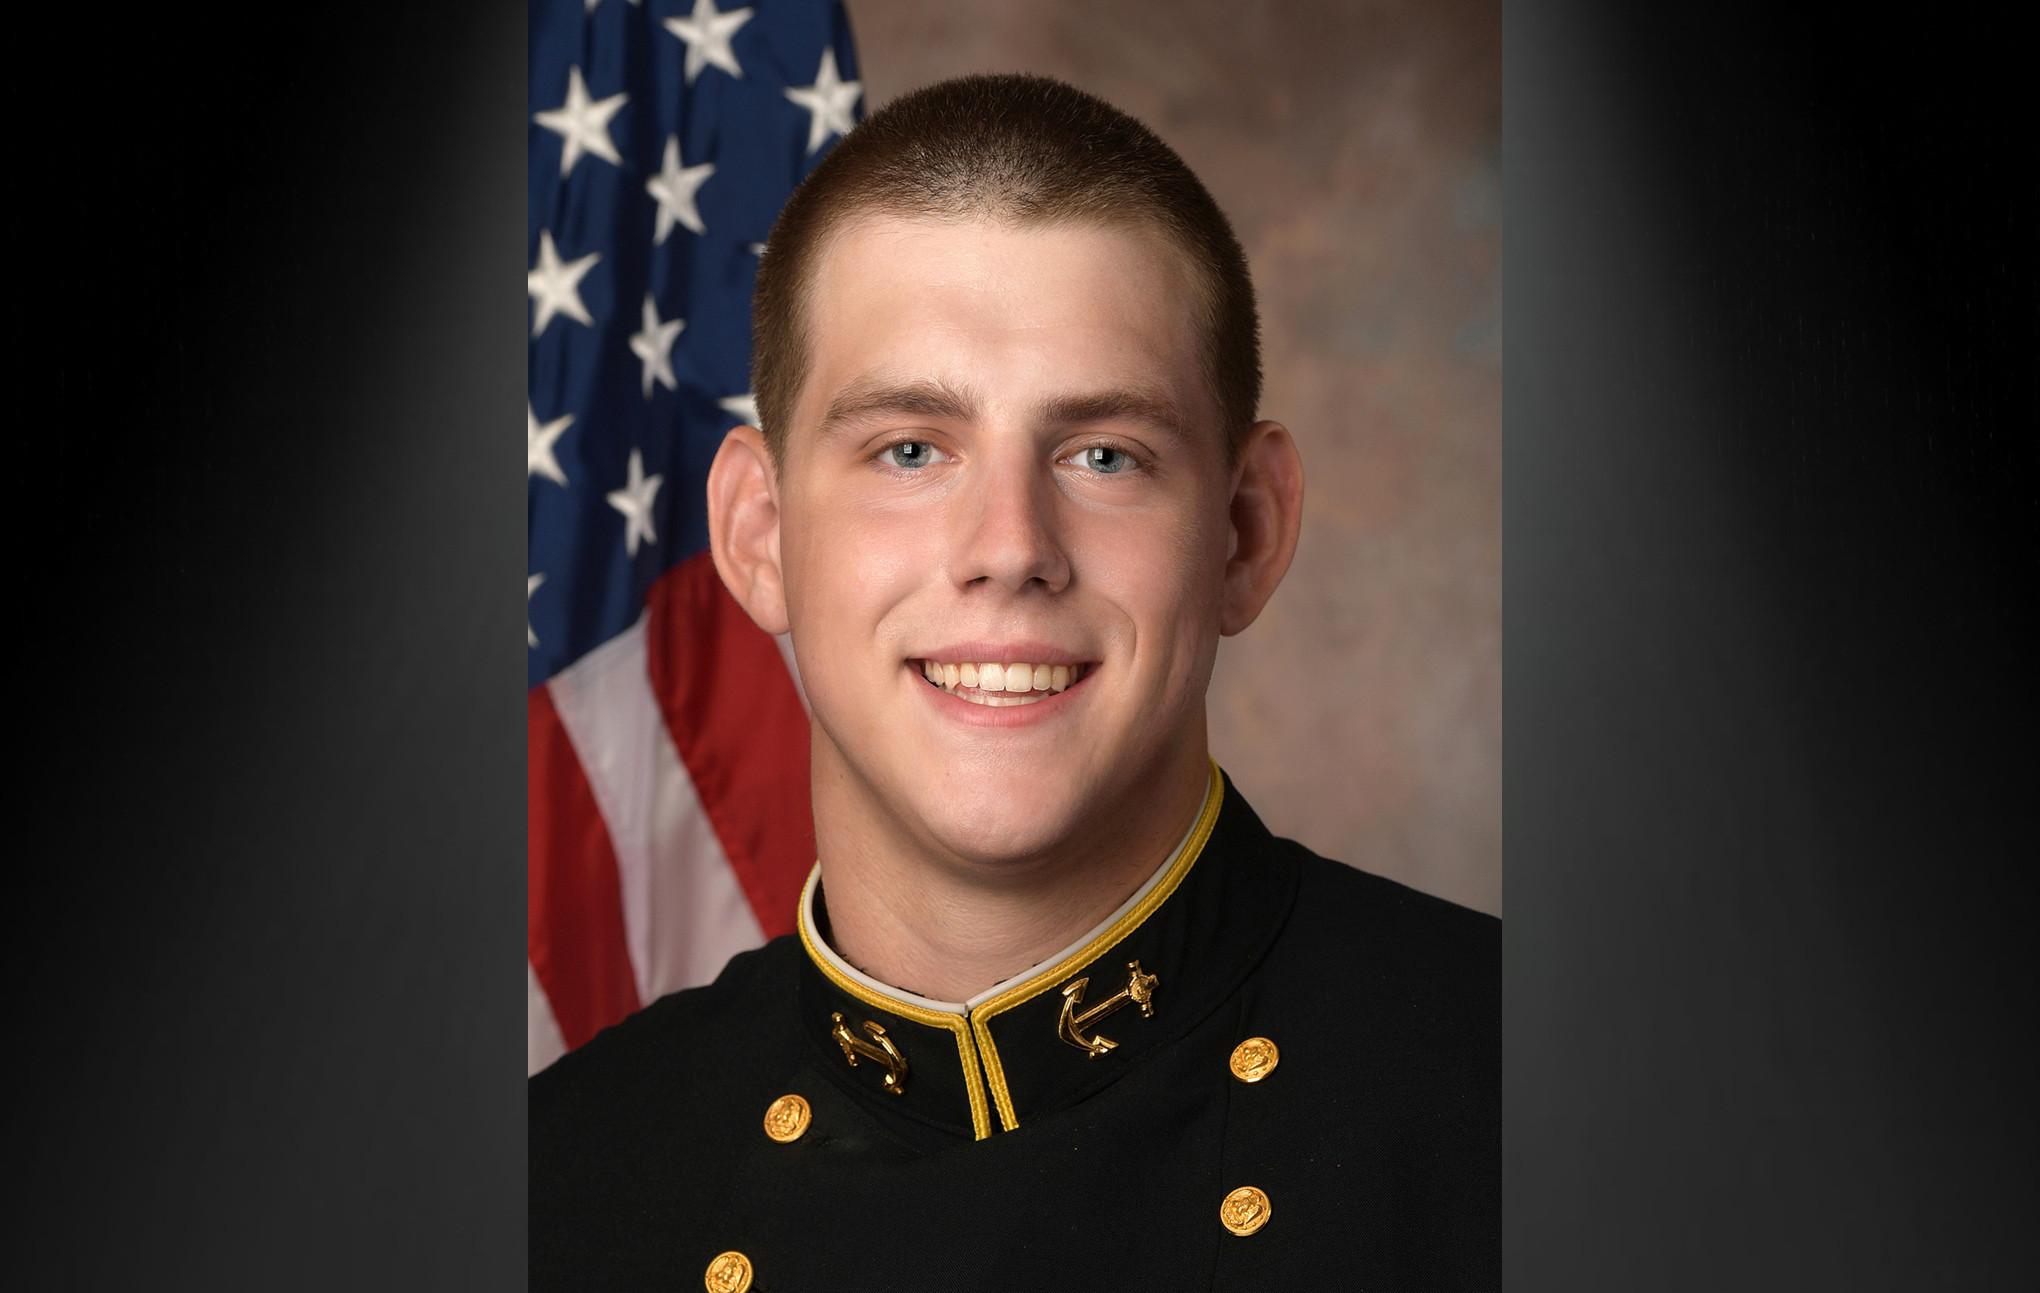 David Forney, Navy offensive lineman, dies at 22